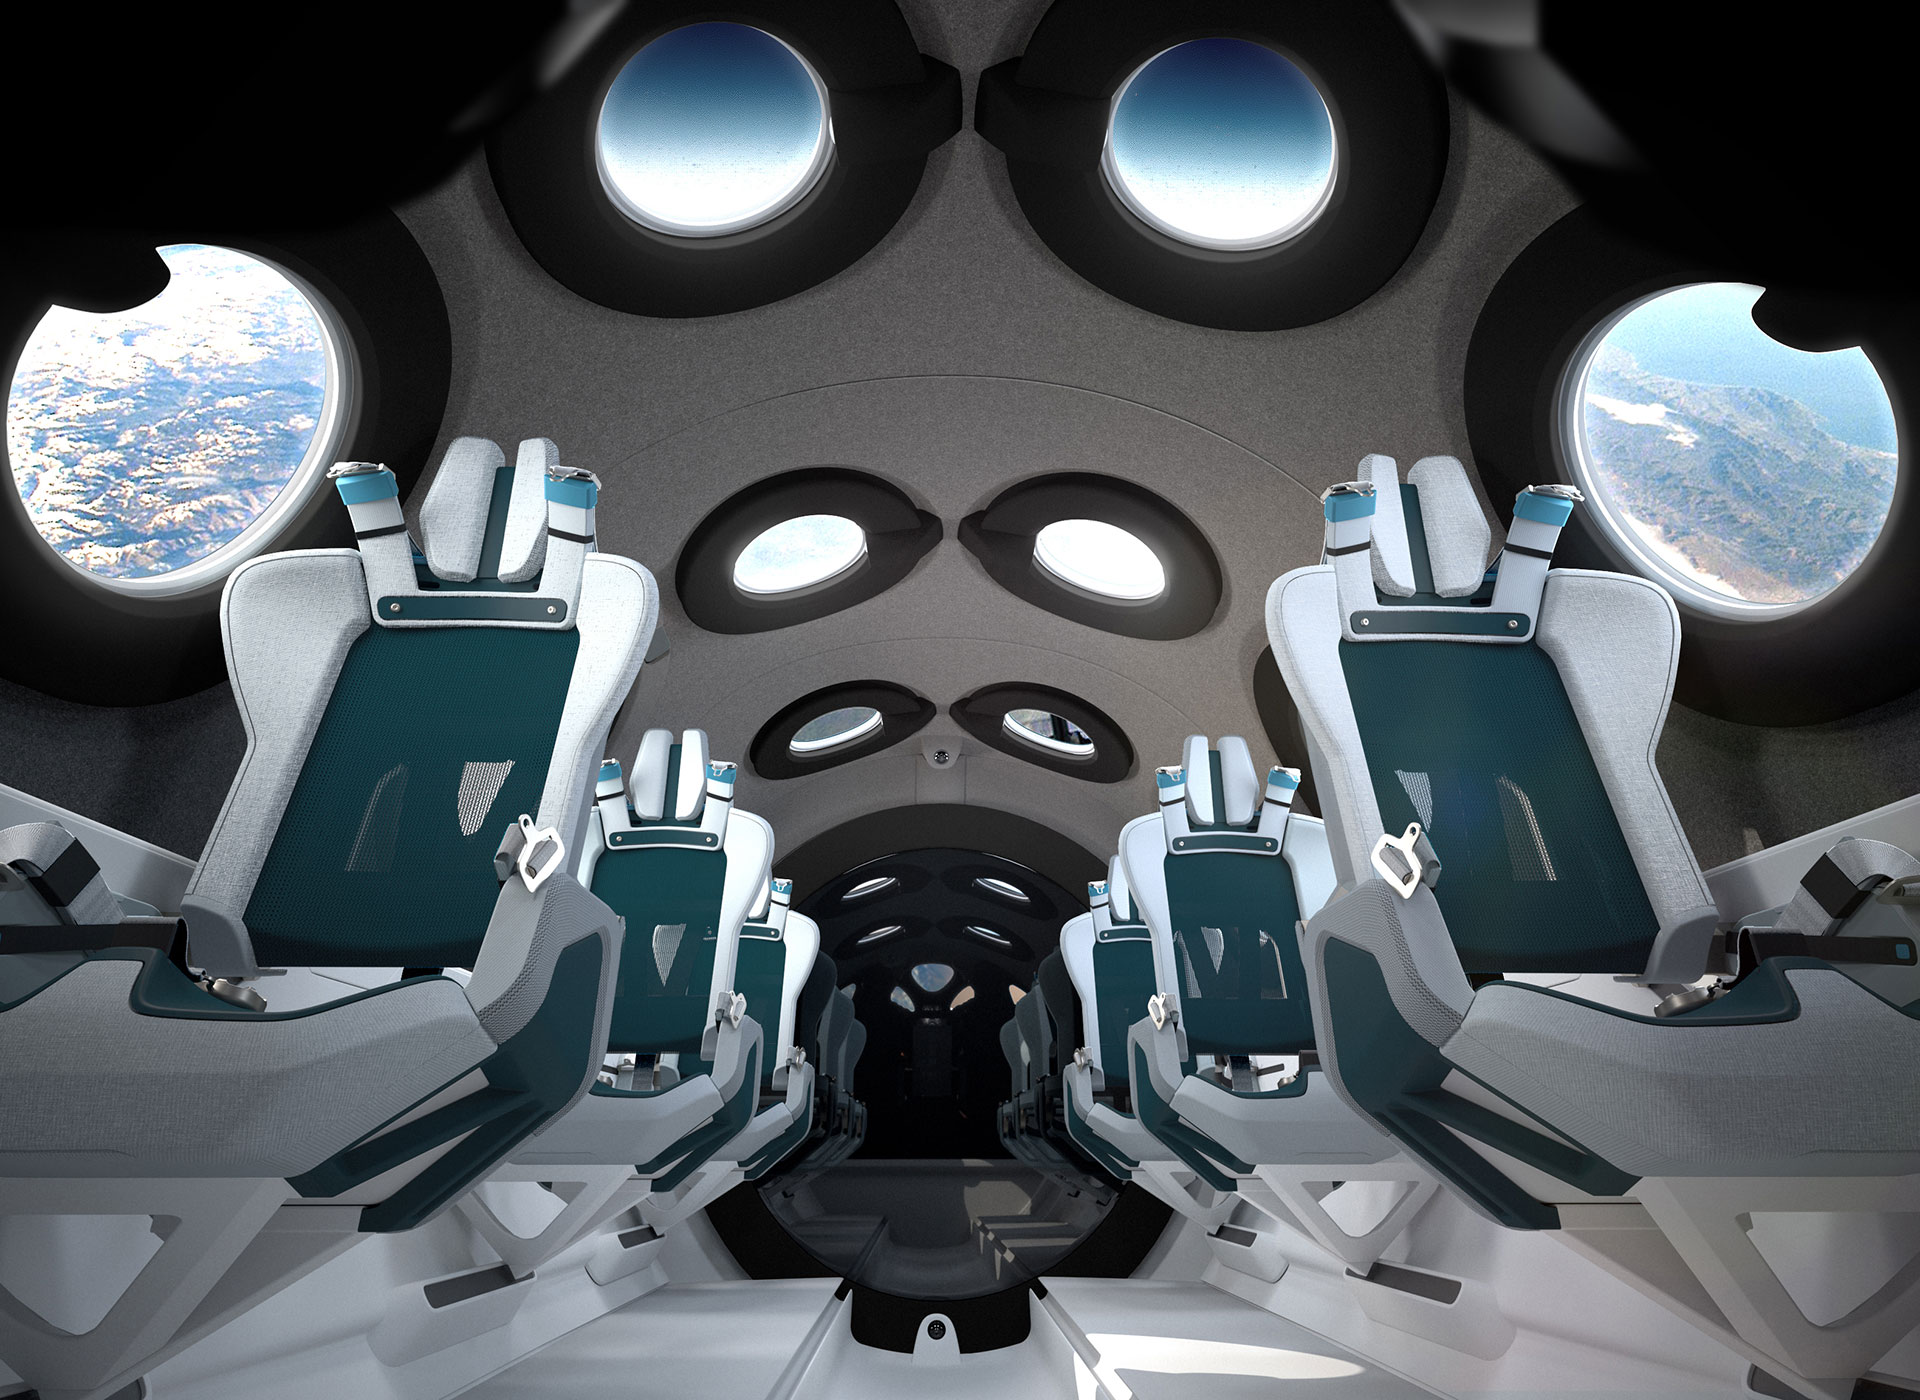 Luxury in space: Virgin Galactic reveals cabin design in key step towards launch